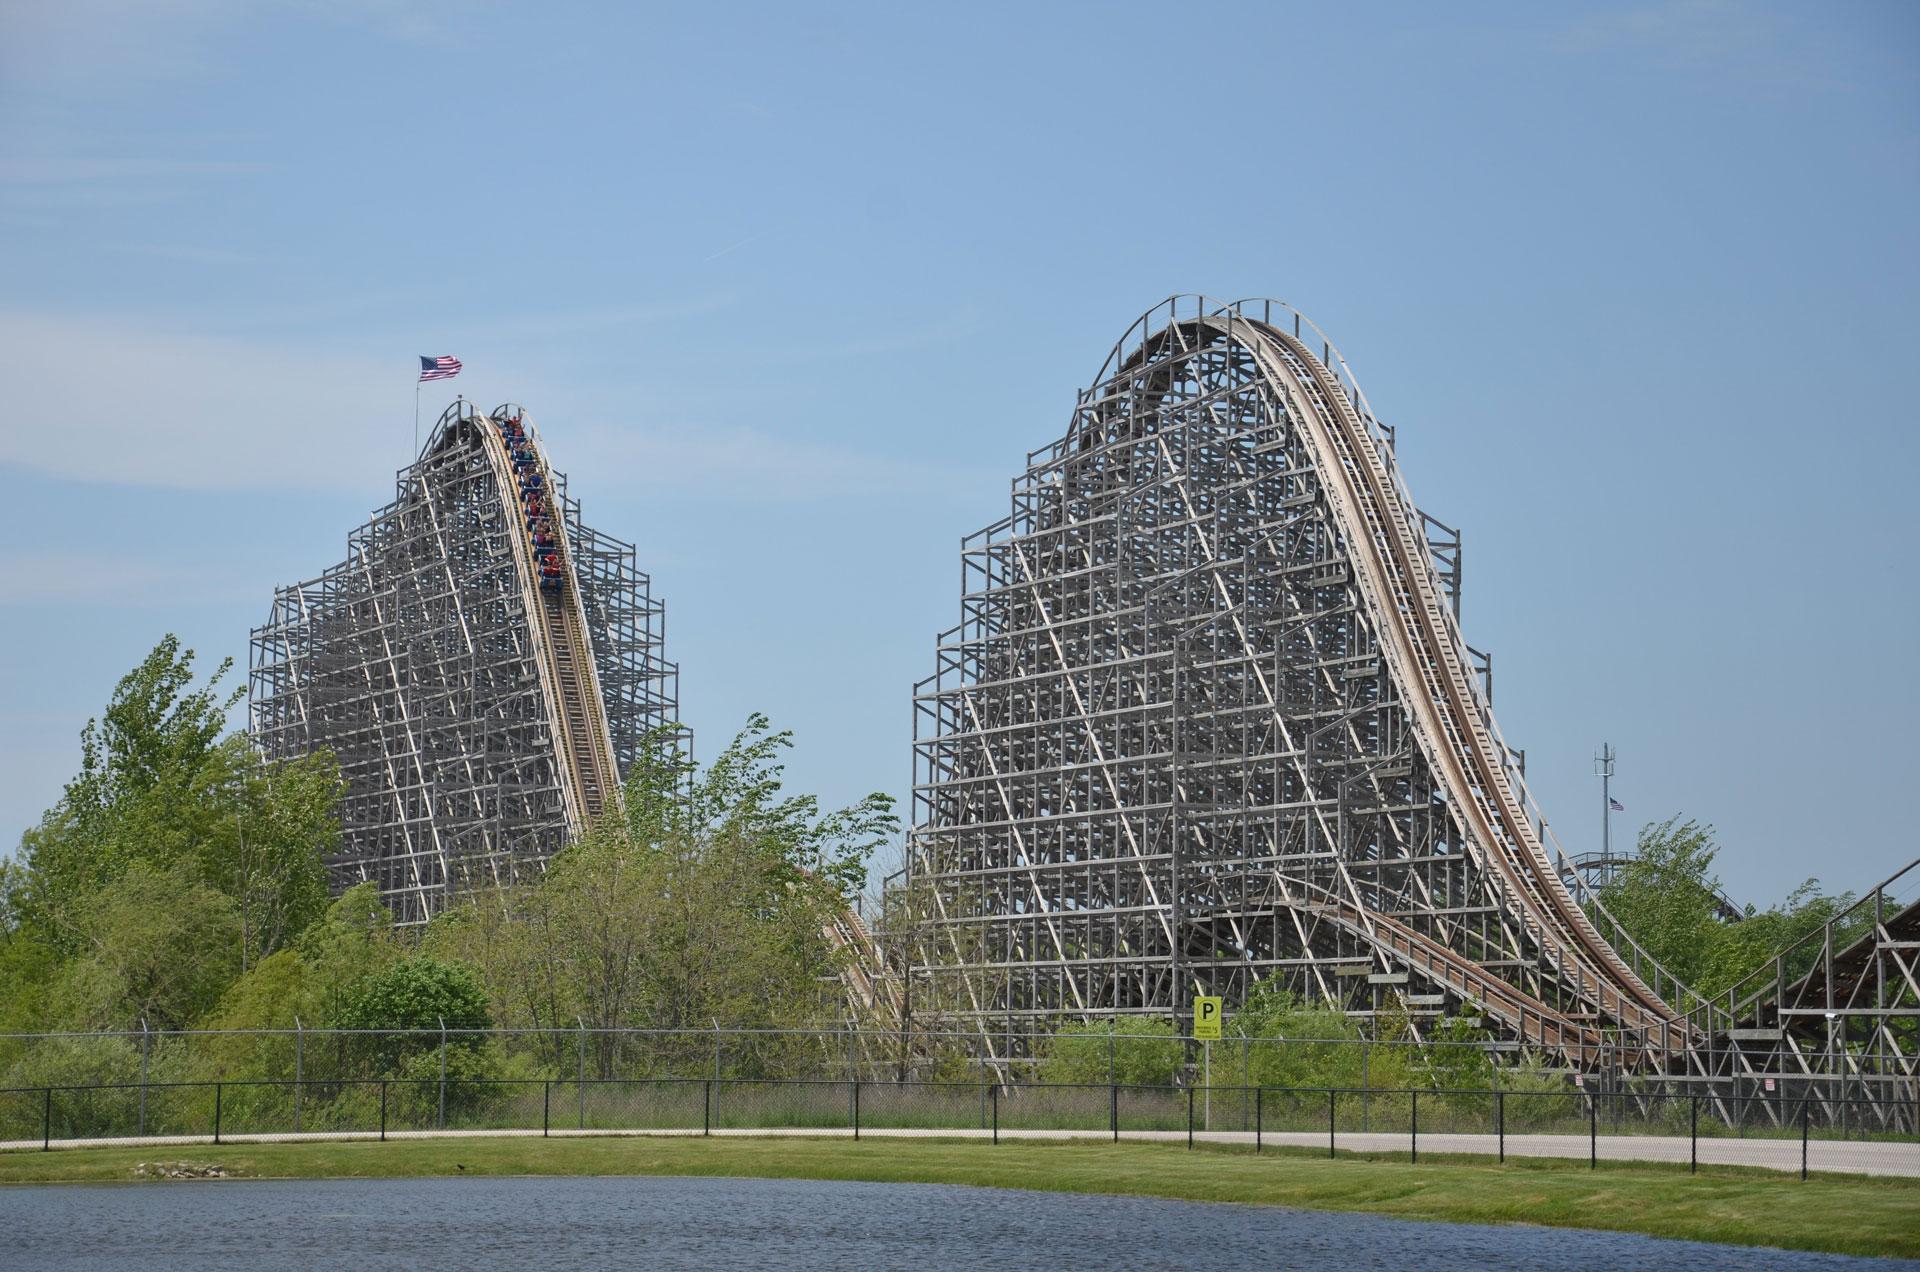 Seabreeze Jack Rabbit Roller Coaster